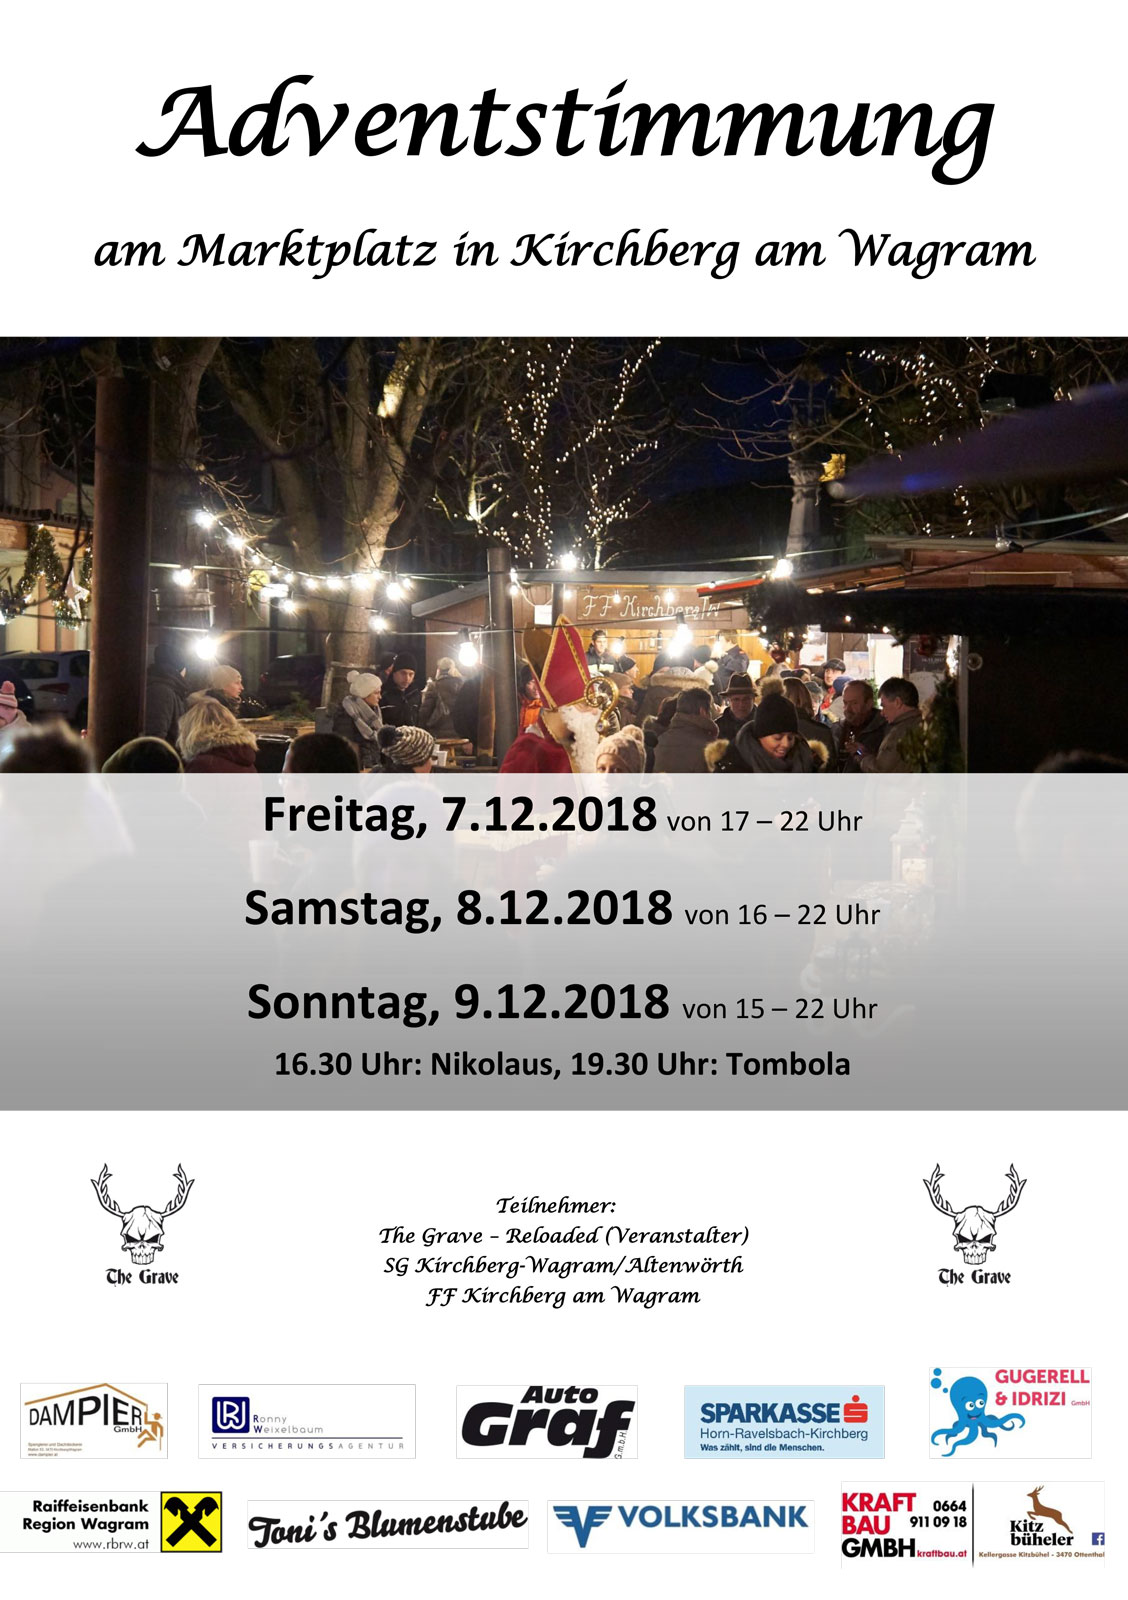 Adventstimmung am Marktplatz Kirchberg am Wagram